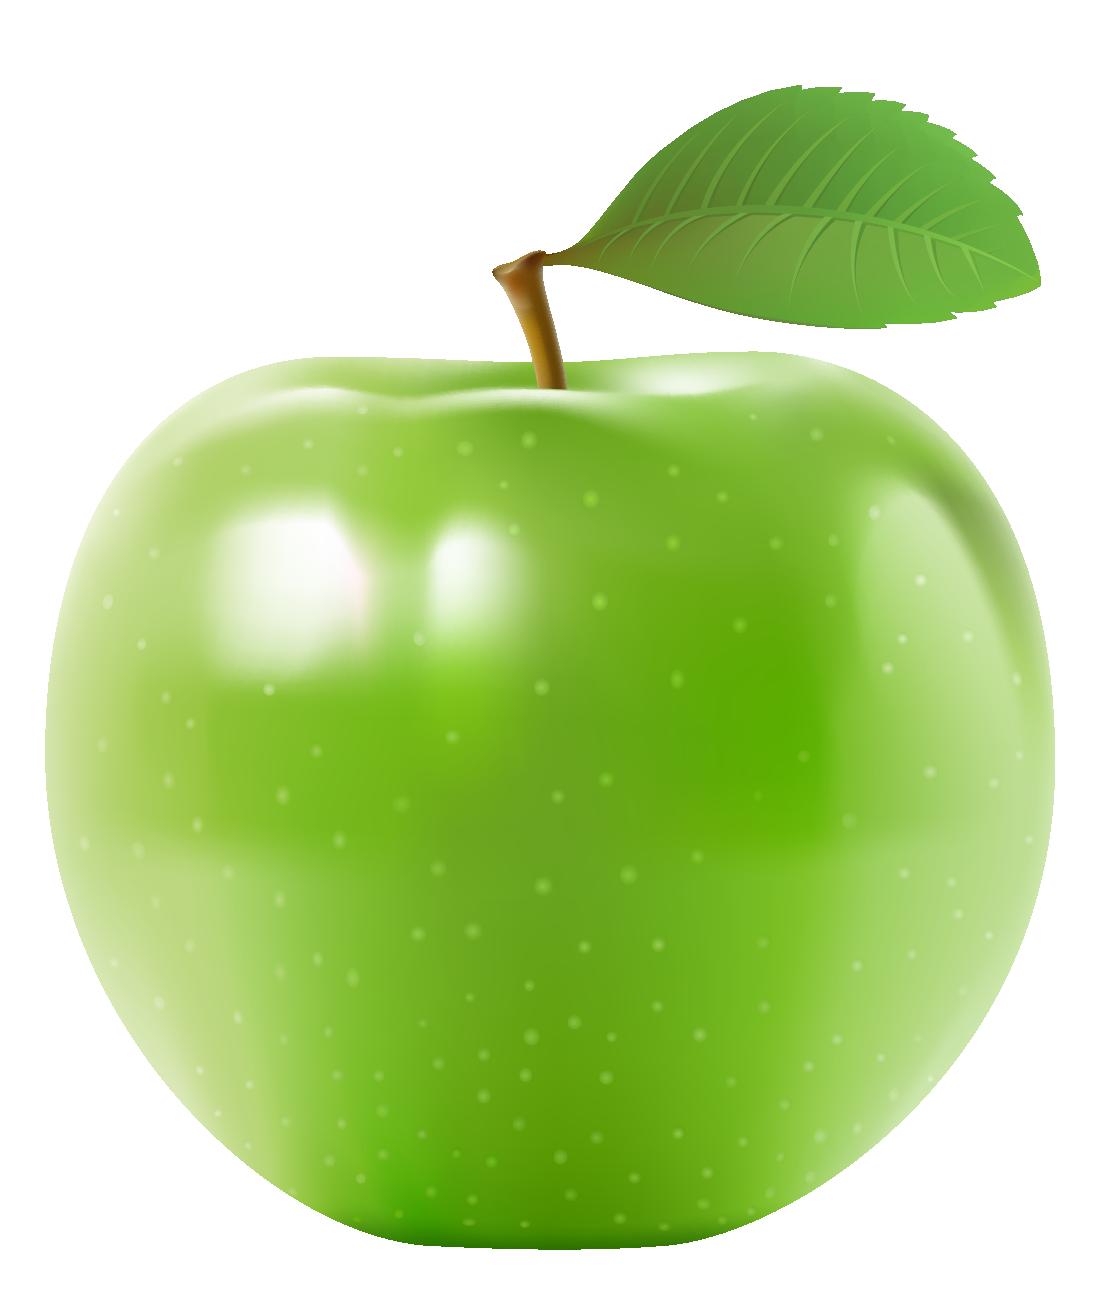 Apple Fruit PNG - 28155